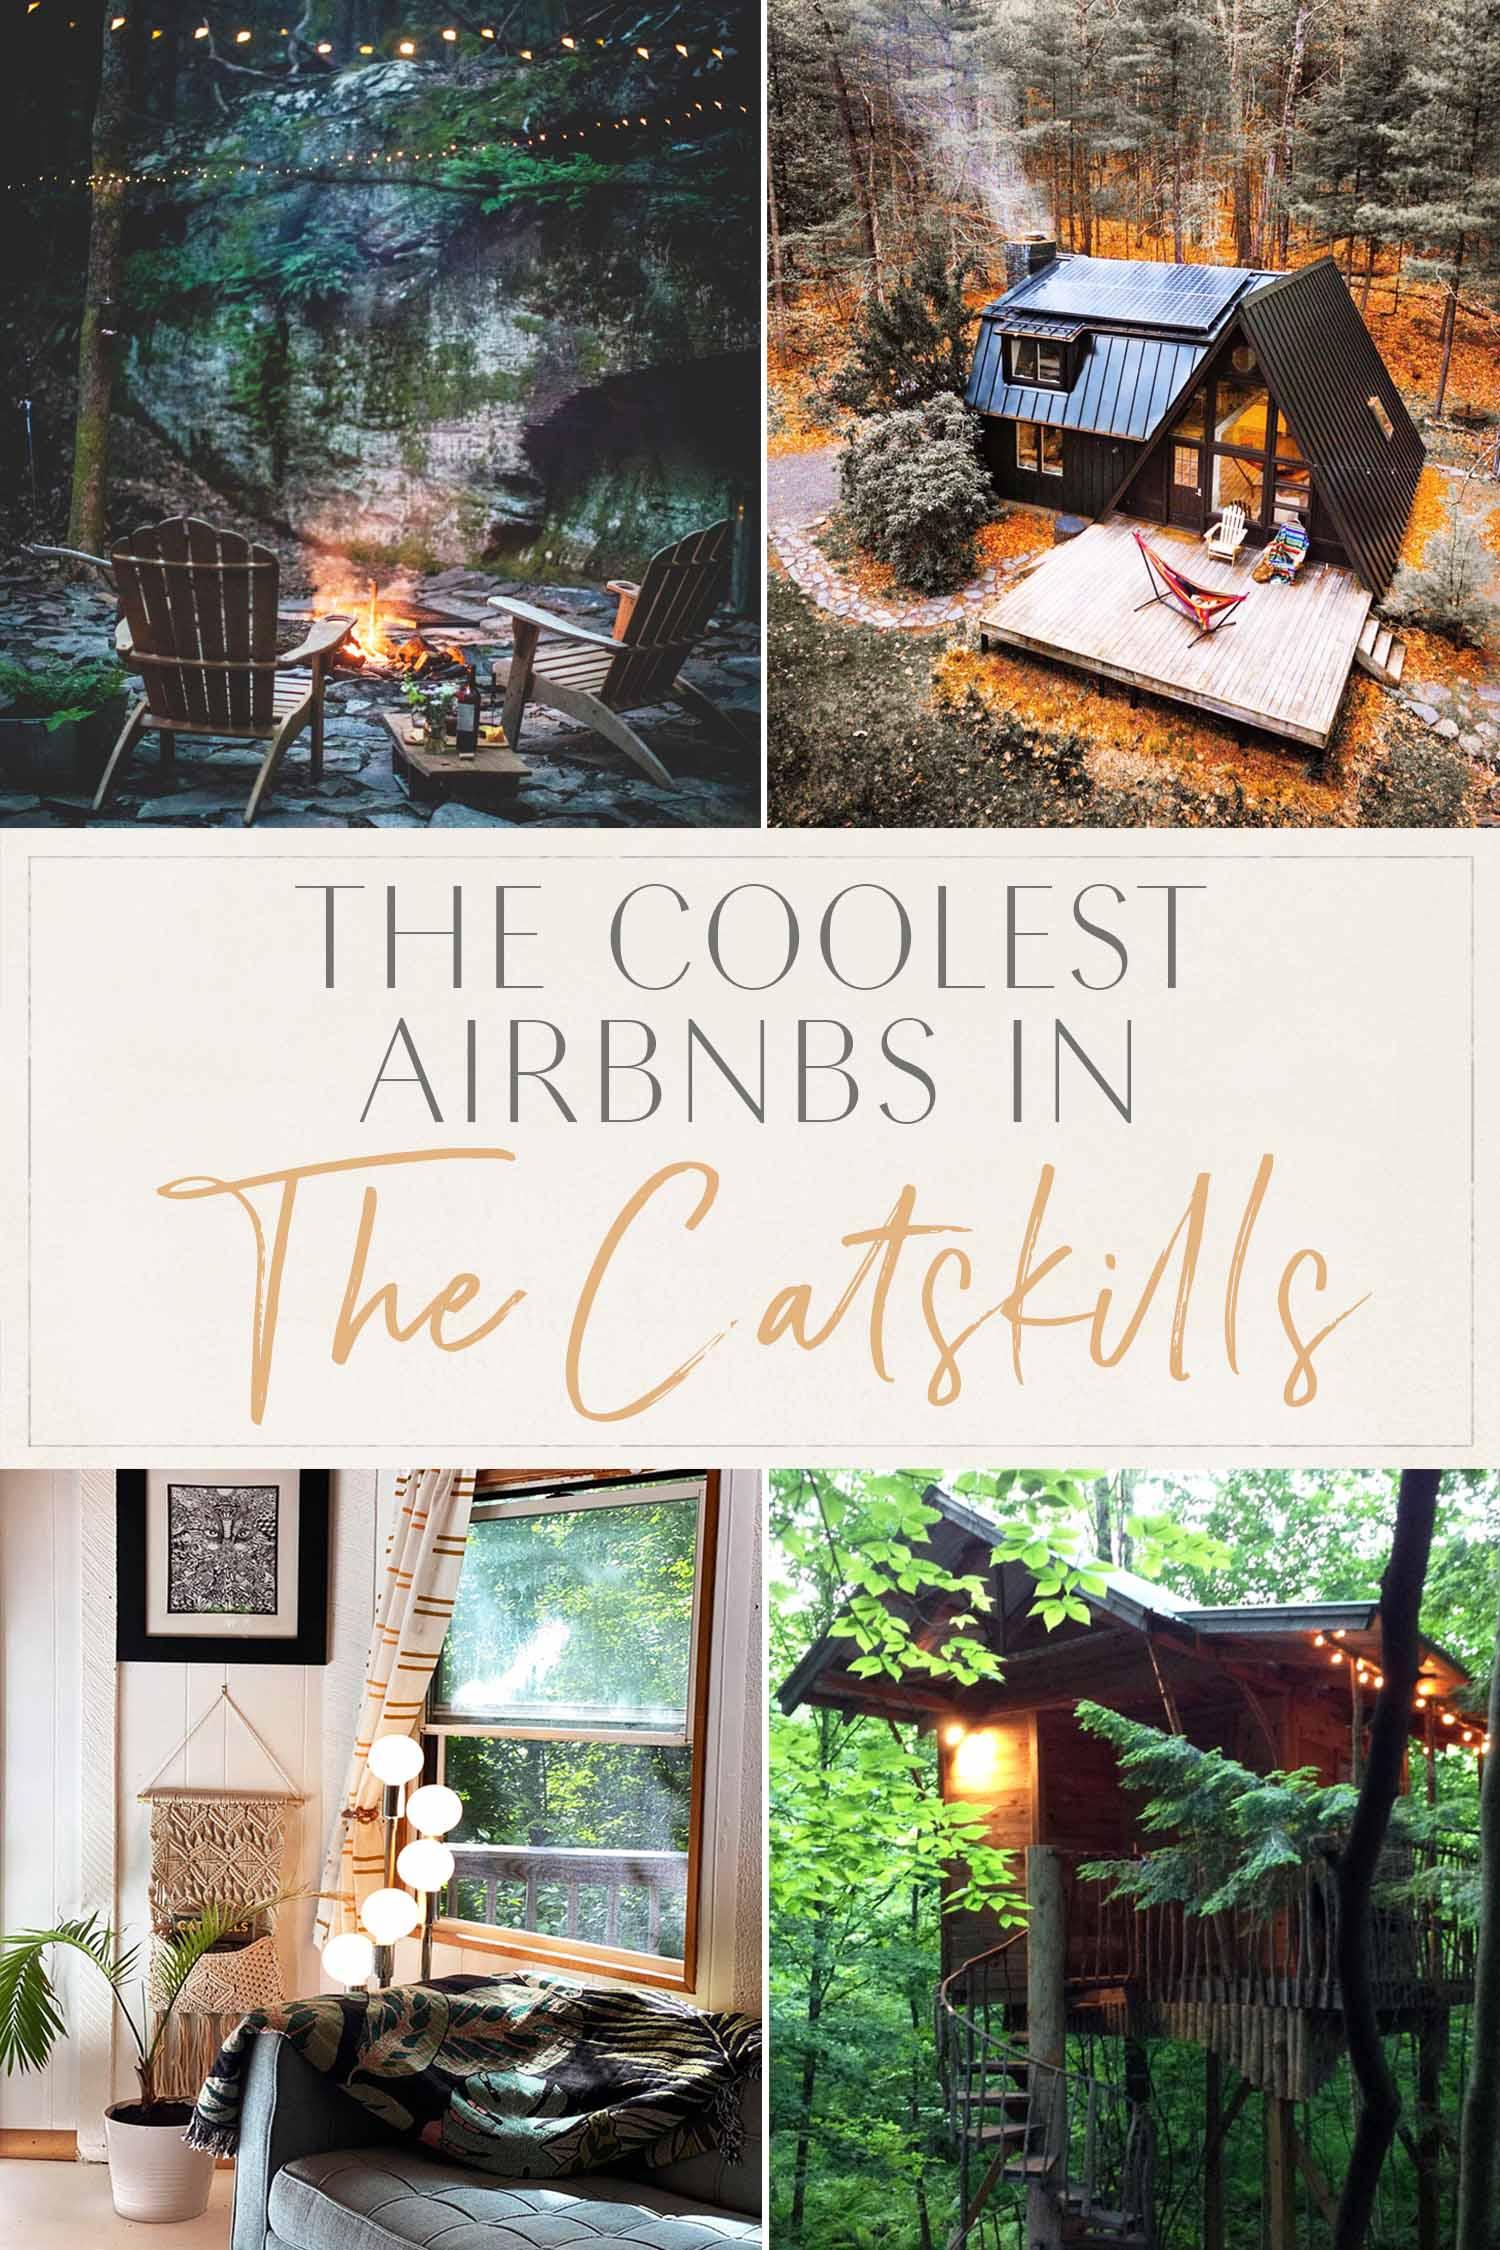 Coolest Airbnbs Catskills